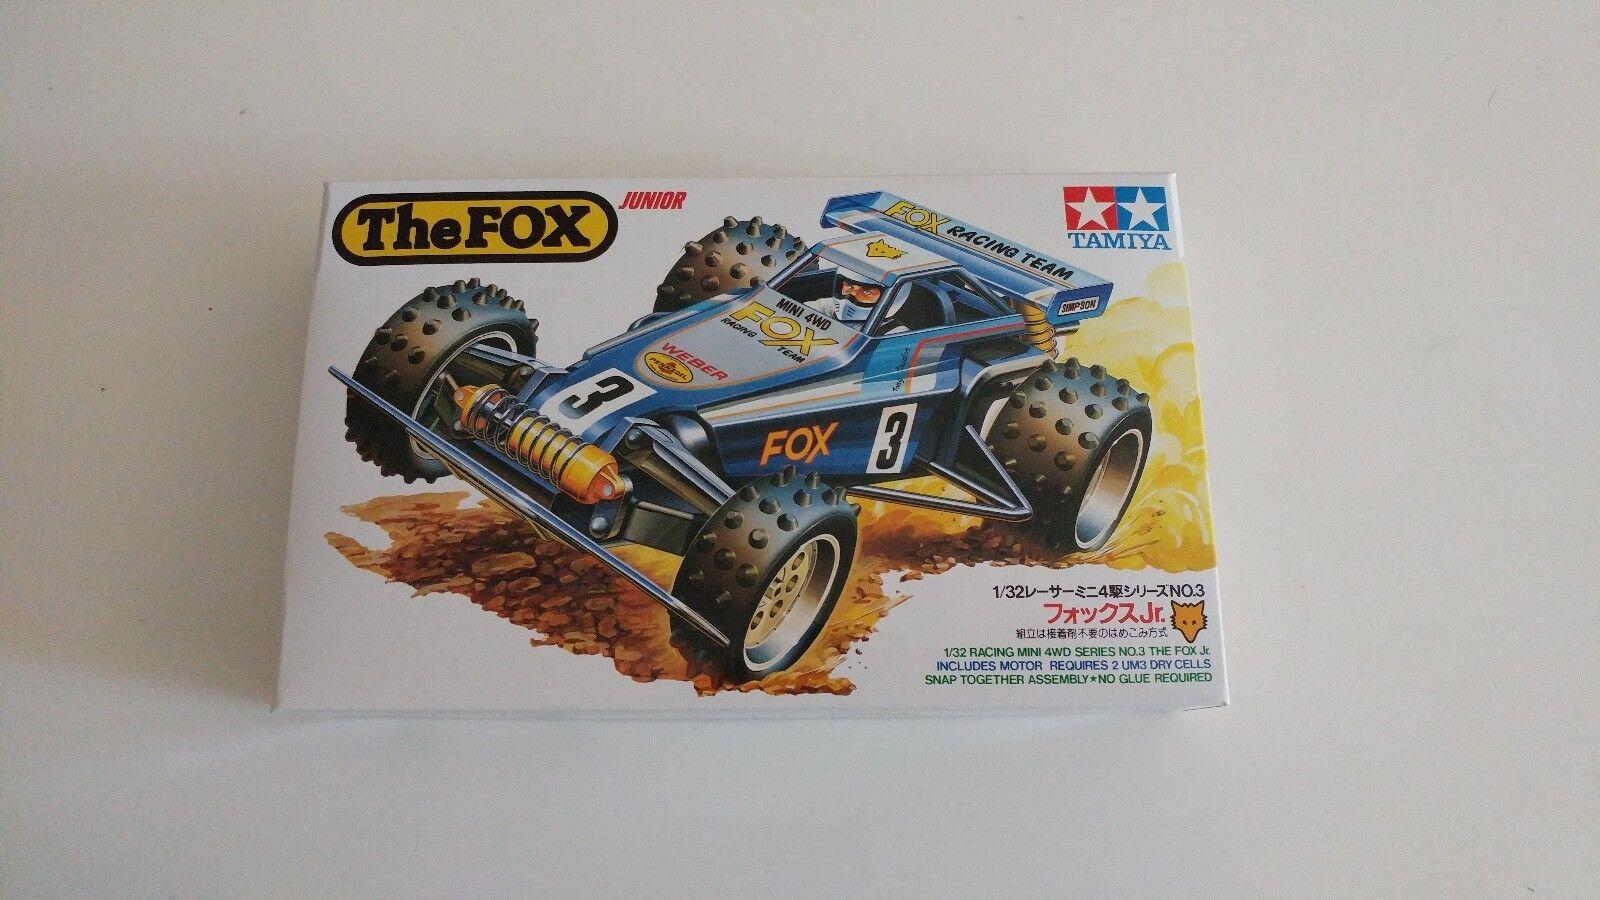 Tamiya 1 32 The Fox Jr. Mini 4WD Vintage 1986 original version 1